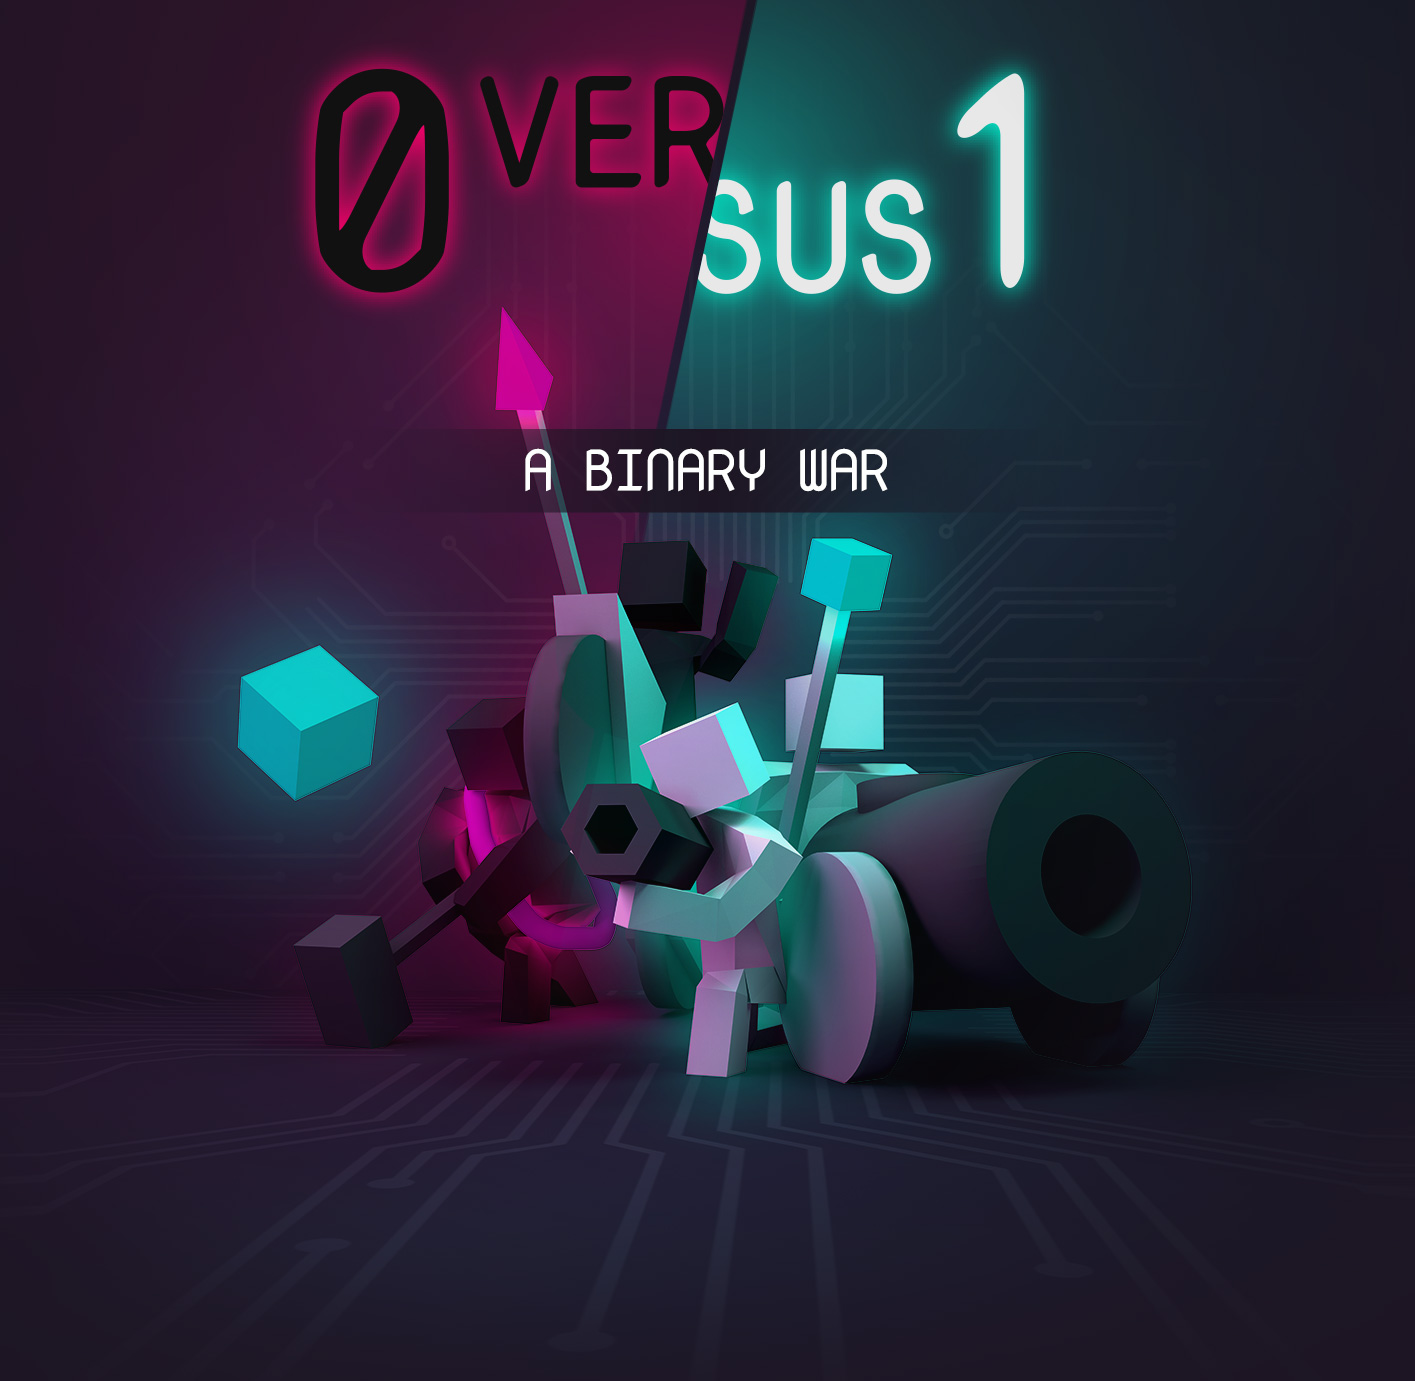 Zero Versus One